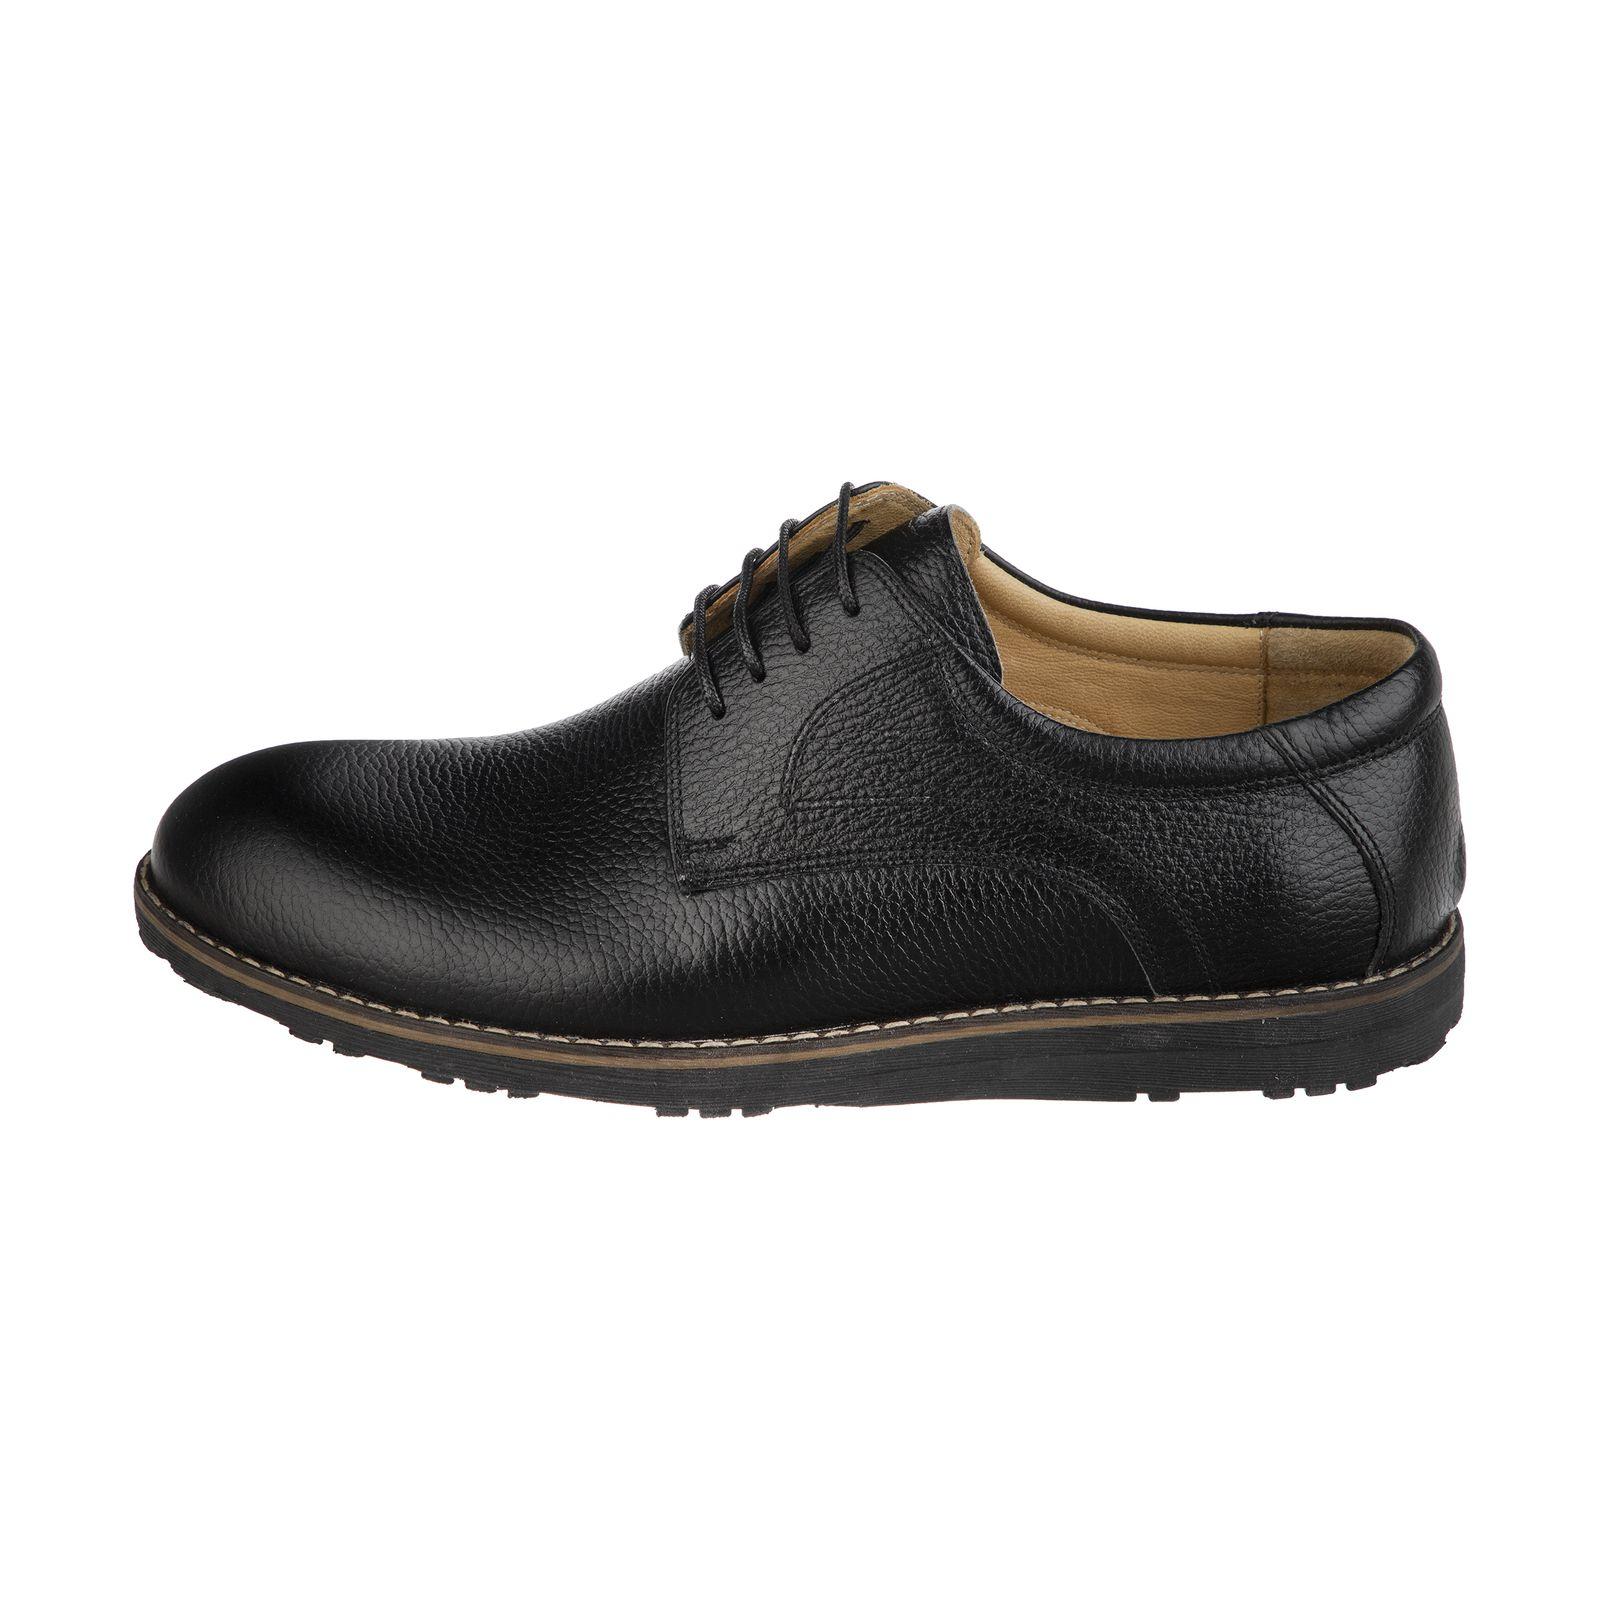 کفش روزمره مردانه شیفر مدل 7046N503101 -  - 2